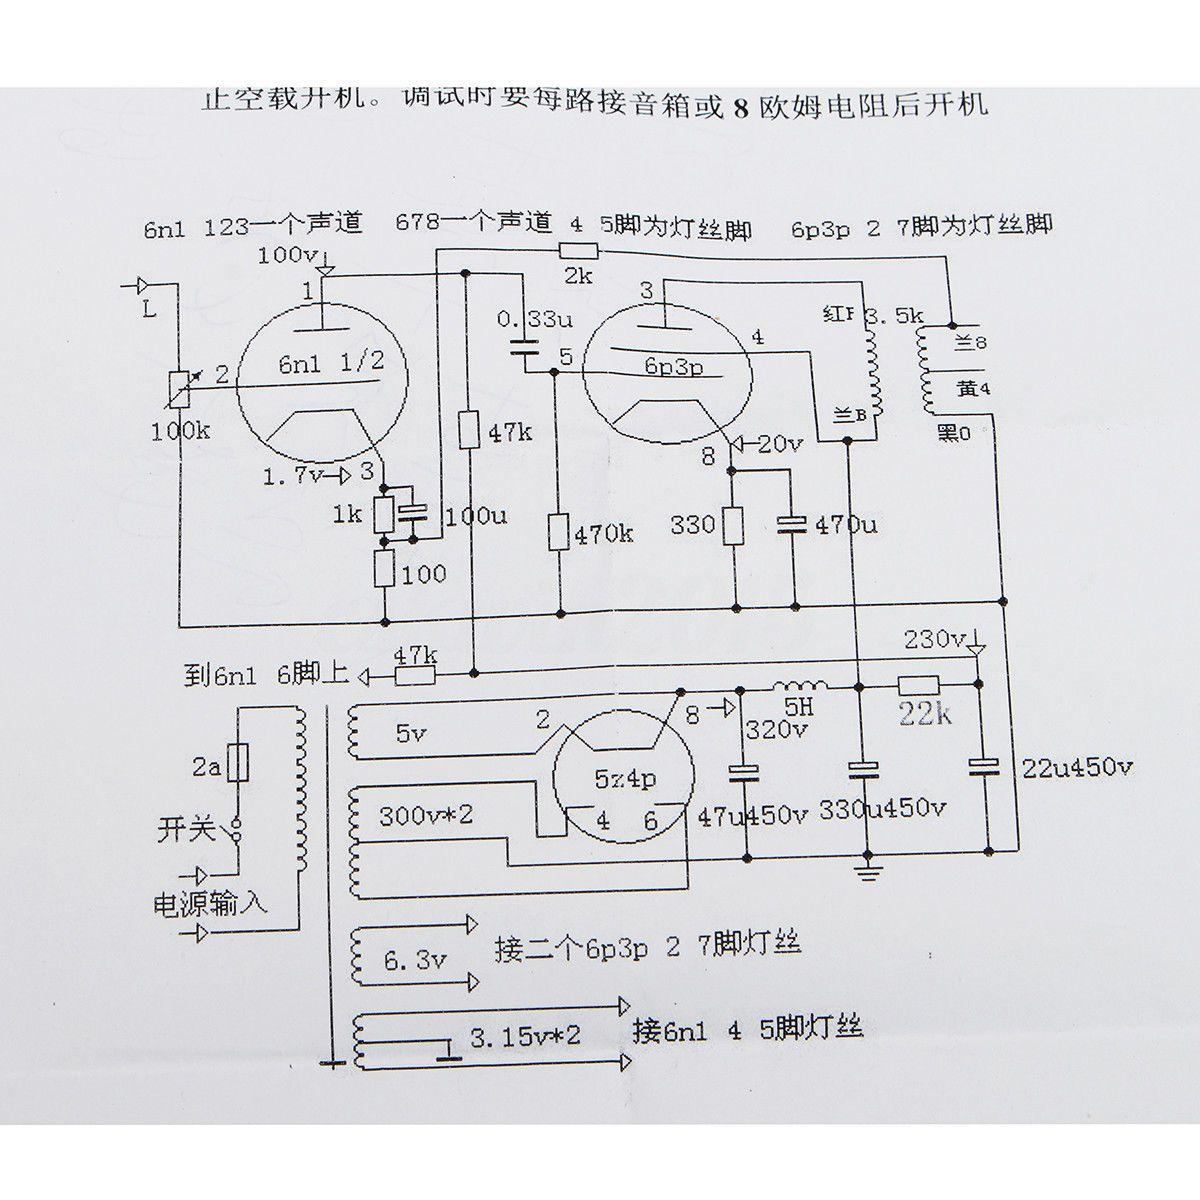 Schemi Elettrici Hi Fi : Hifi 5z4p 6n1 6p3p vacuum tube amplifier single ended class a hifi